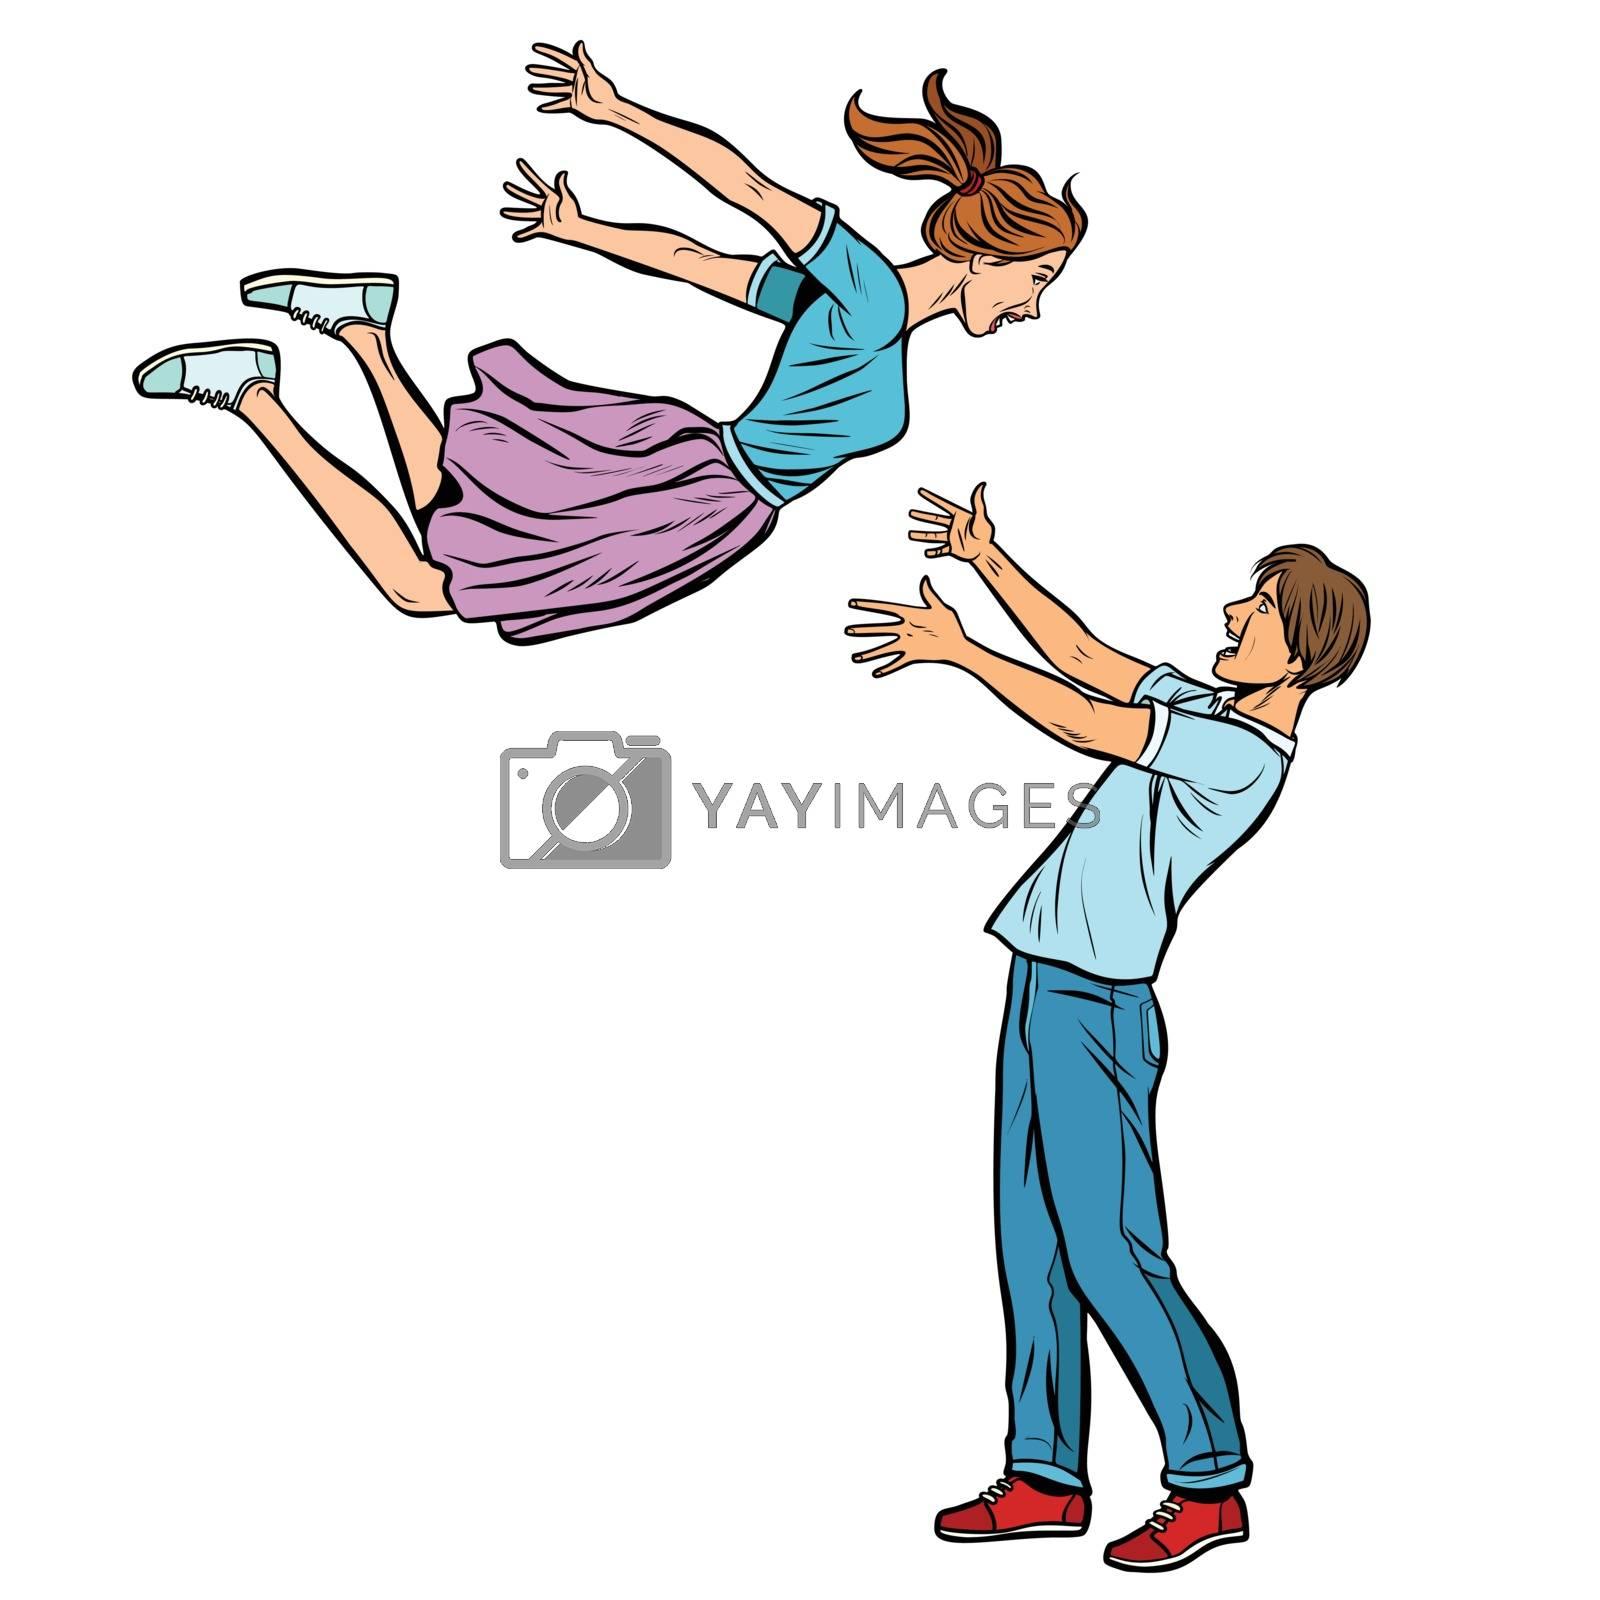 love and romance couple hugs meeting, girl flies into the hands of young men. Comic cartoon pop art vector retro vintage drawing